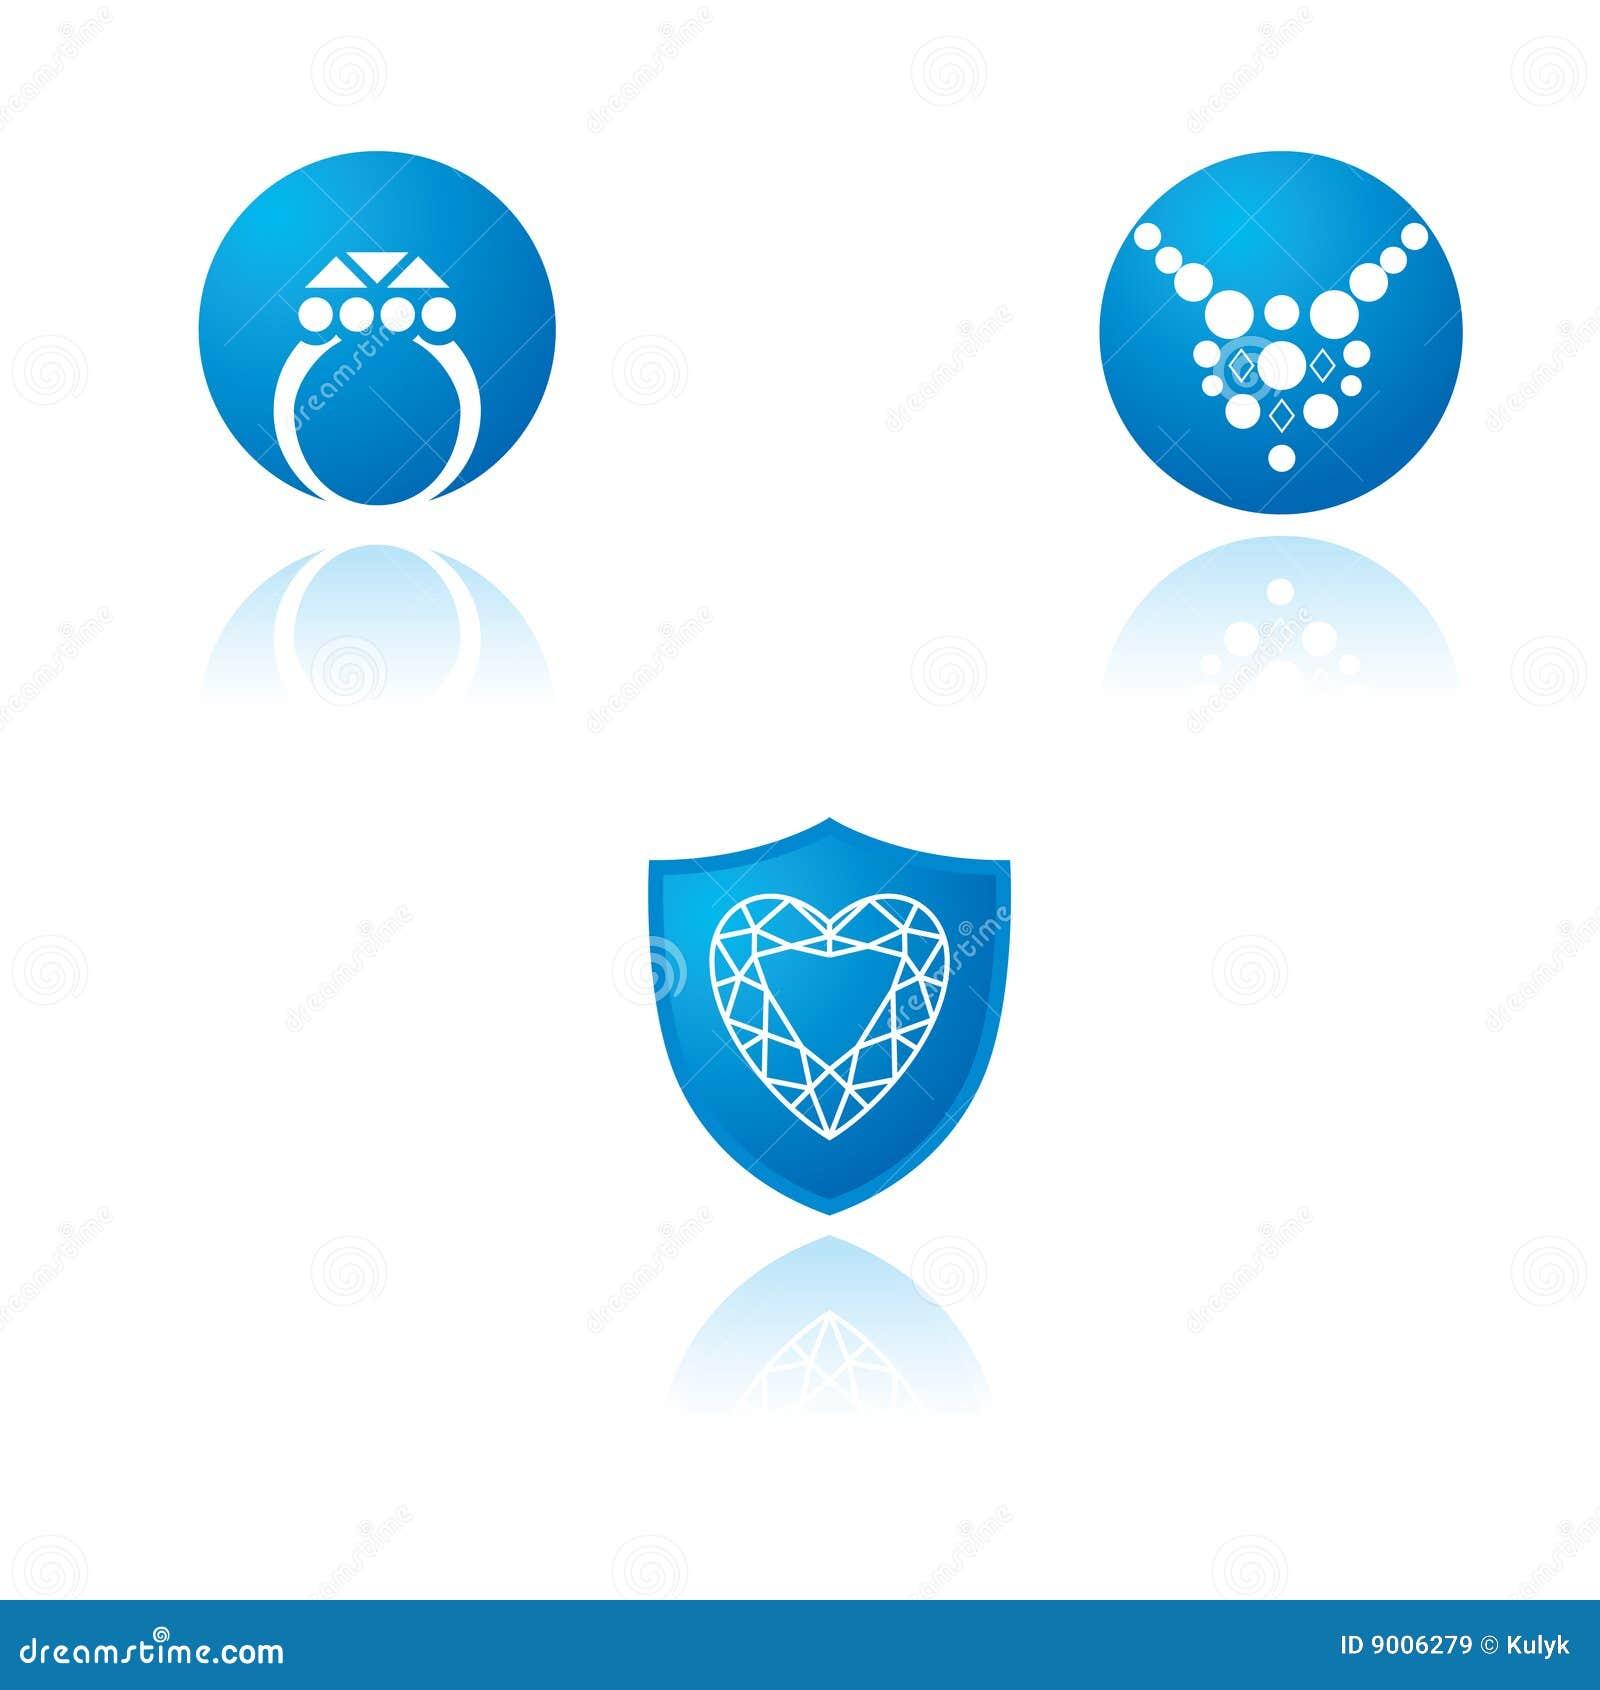 Diamond Jewelry Company